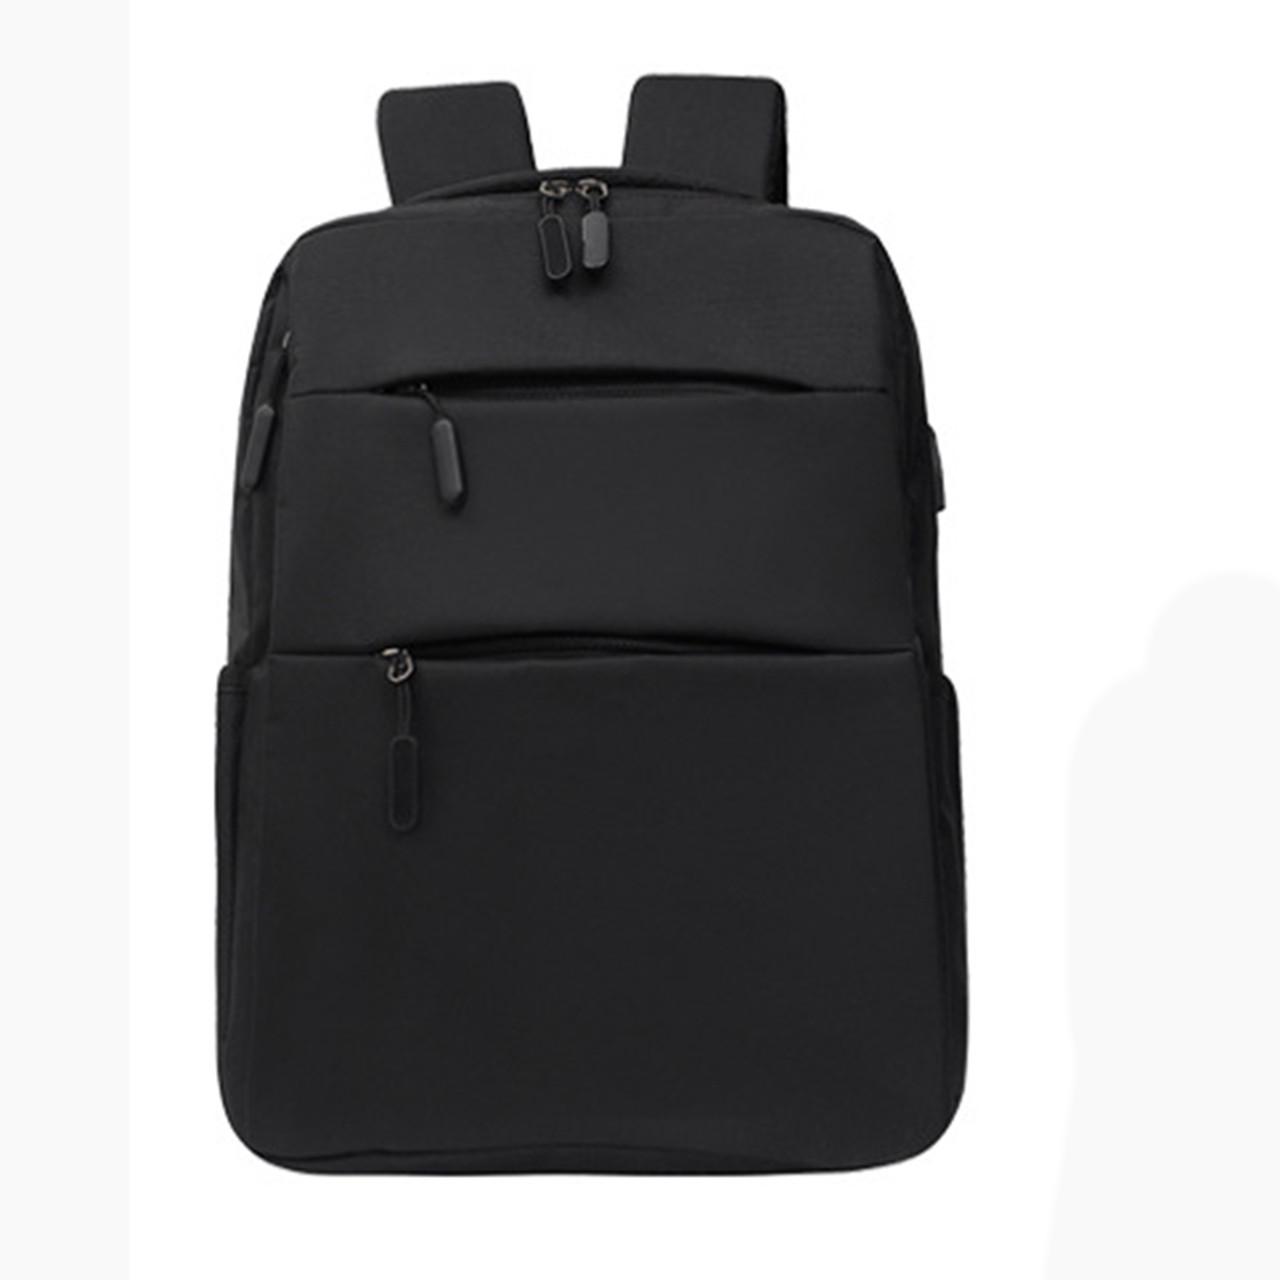 Рюкзак молодіжний Backpack чорний з USB